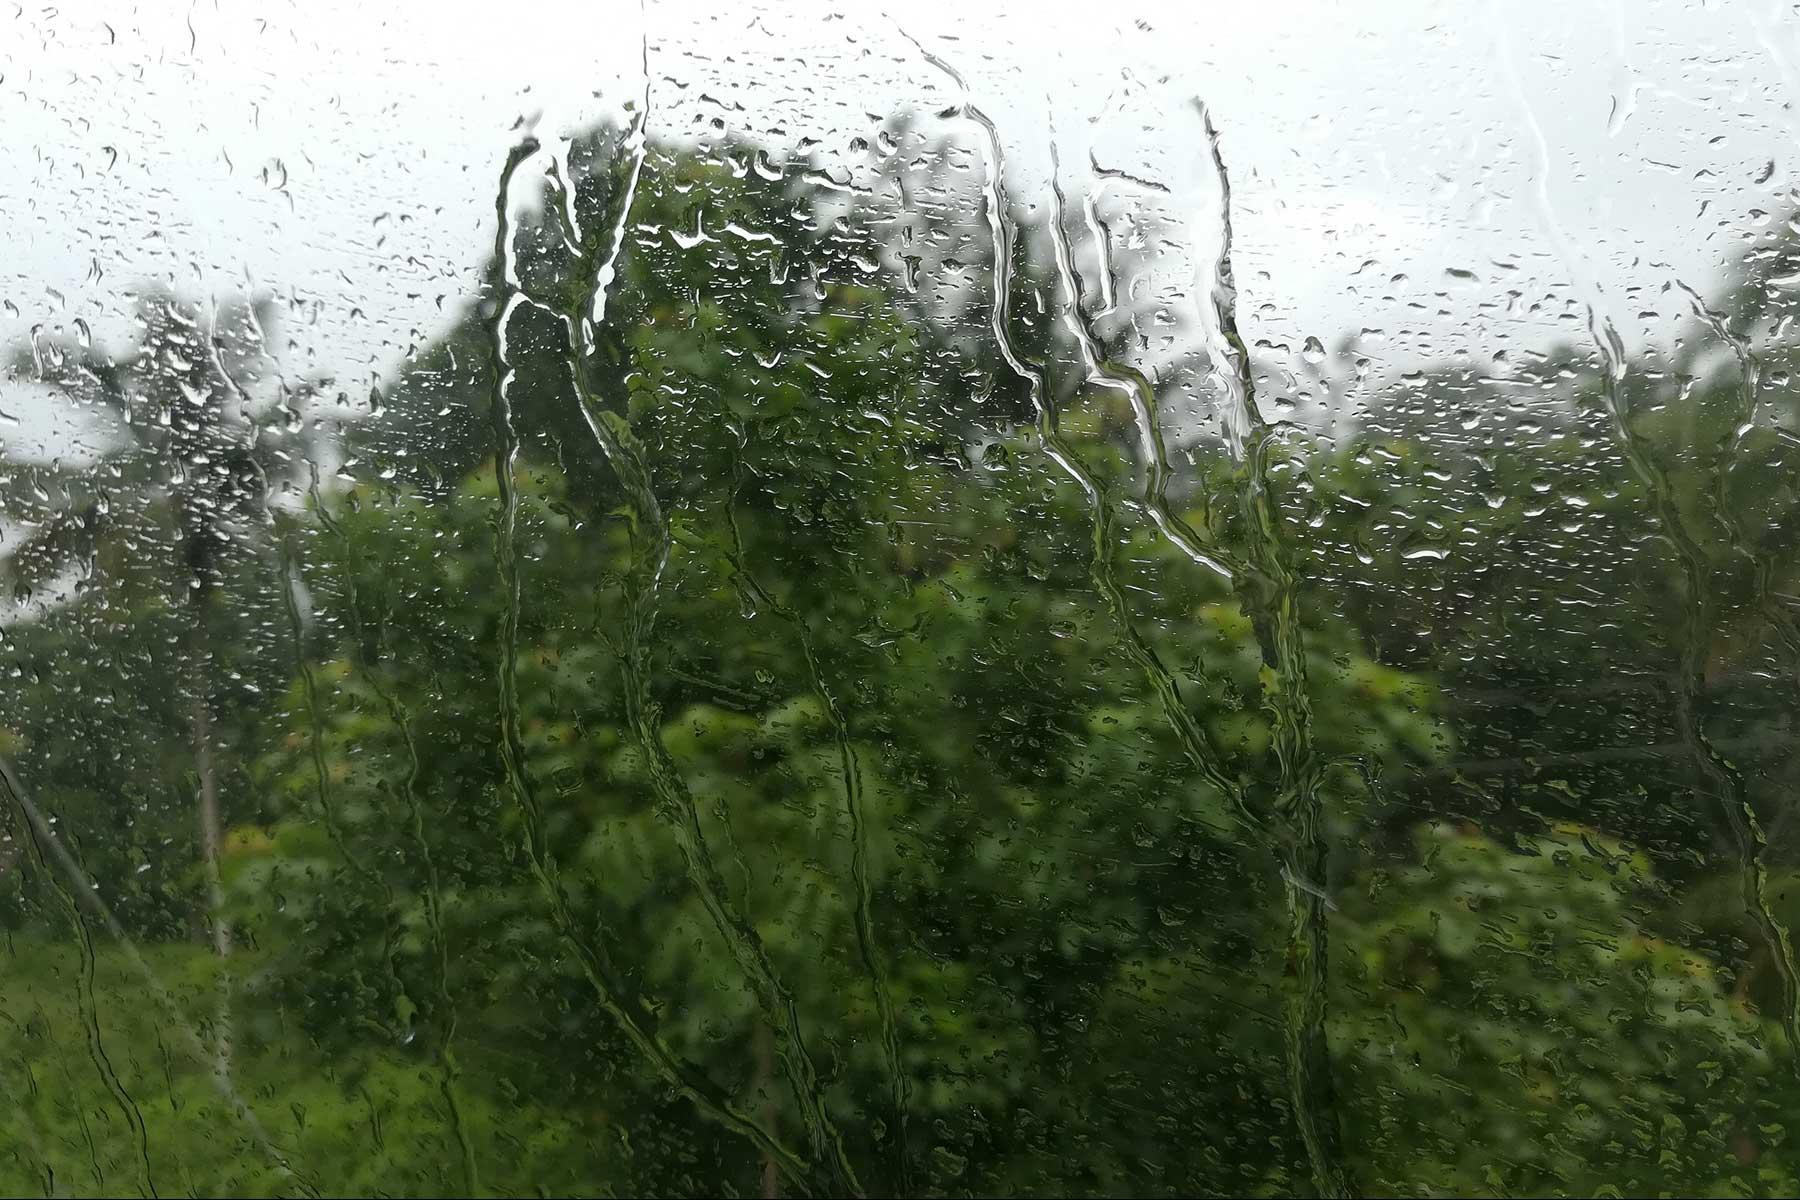 Rain on the way to Wayanad